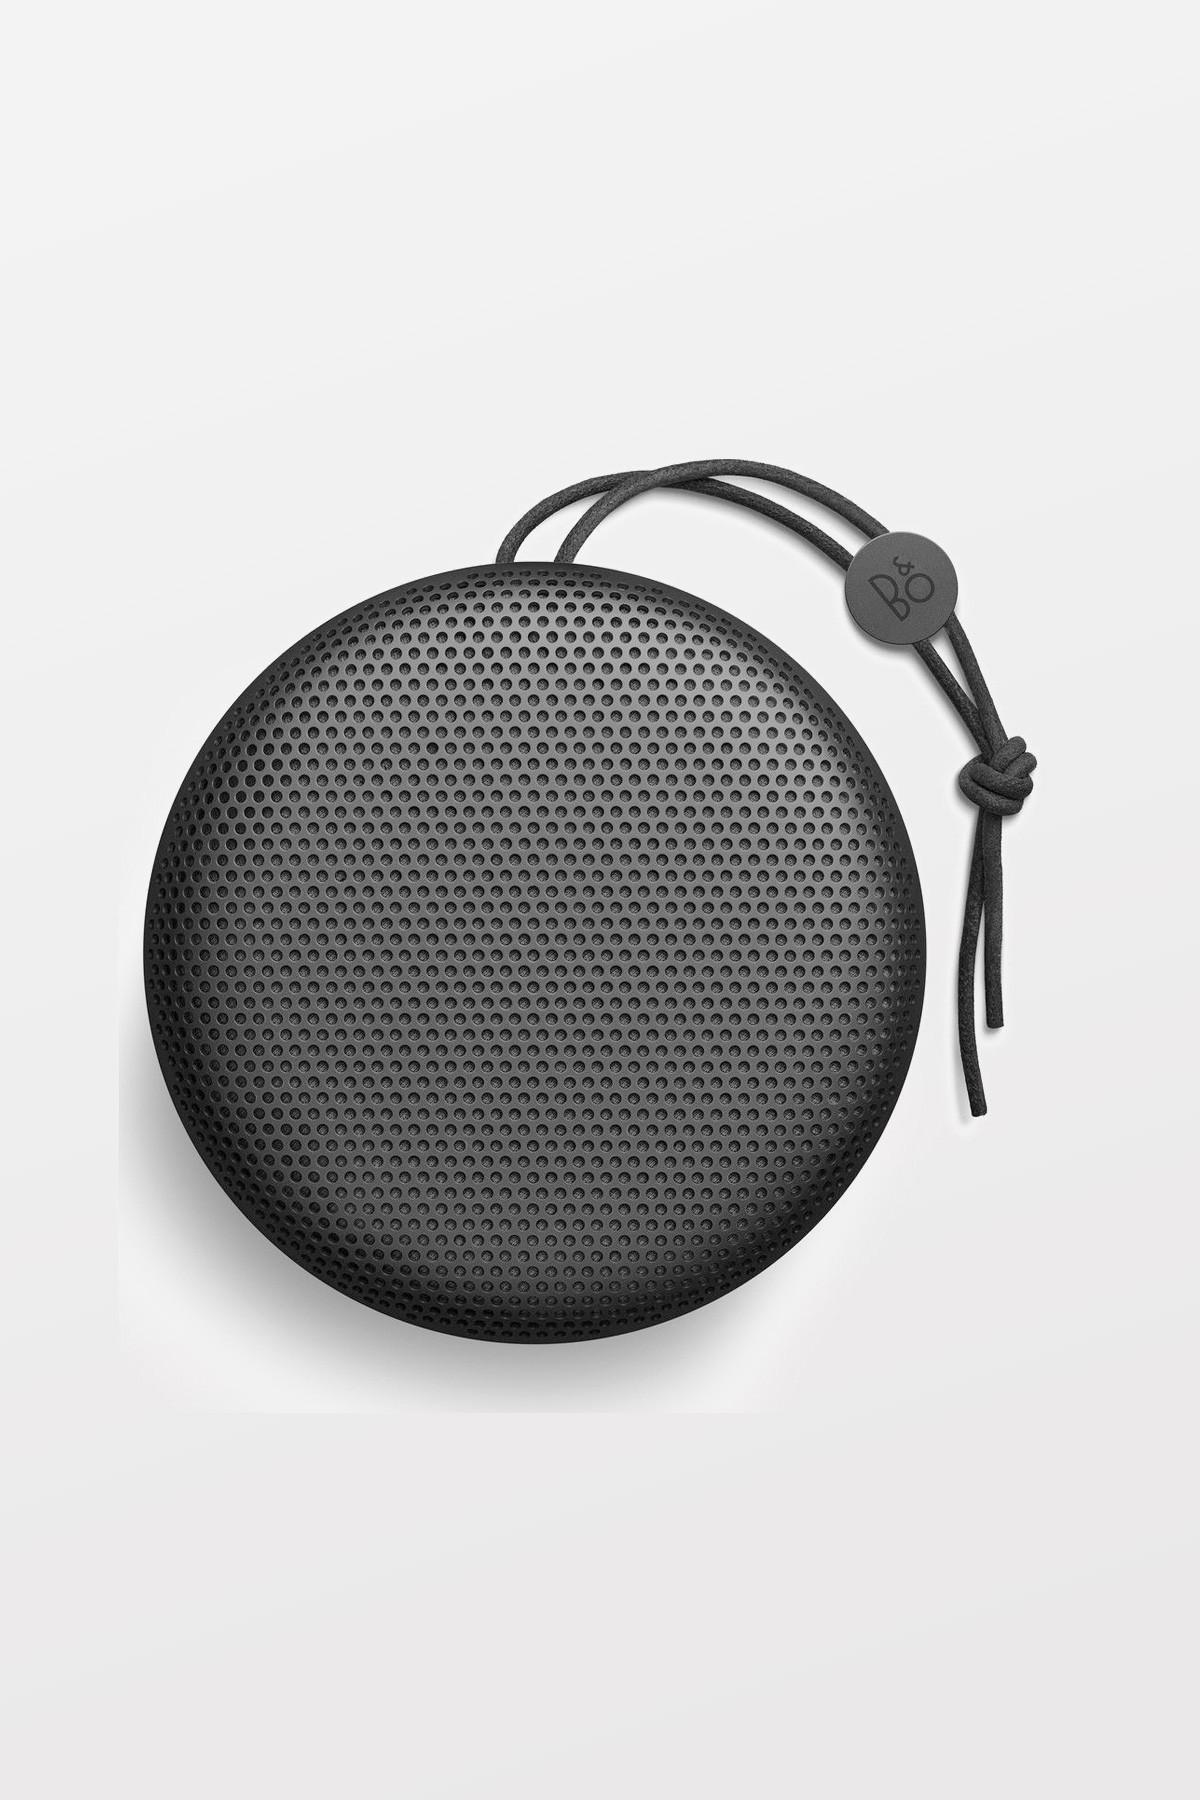 B&O Beoplay A1 Portable Bluetooth Speaker - Black